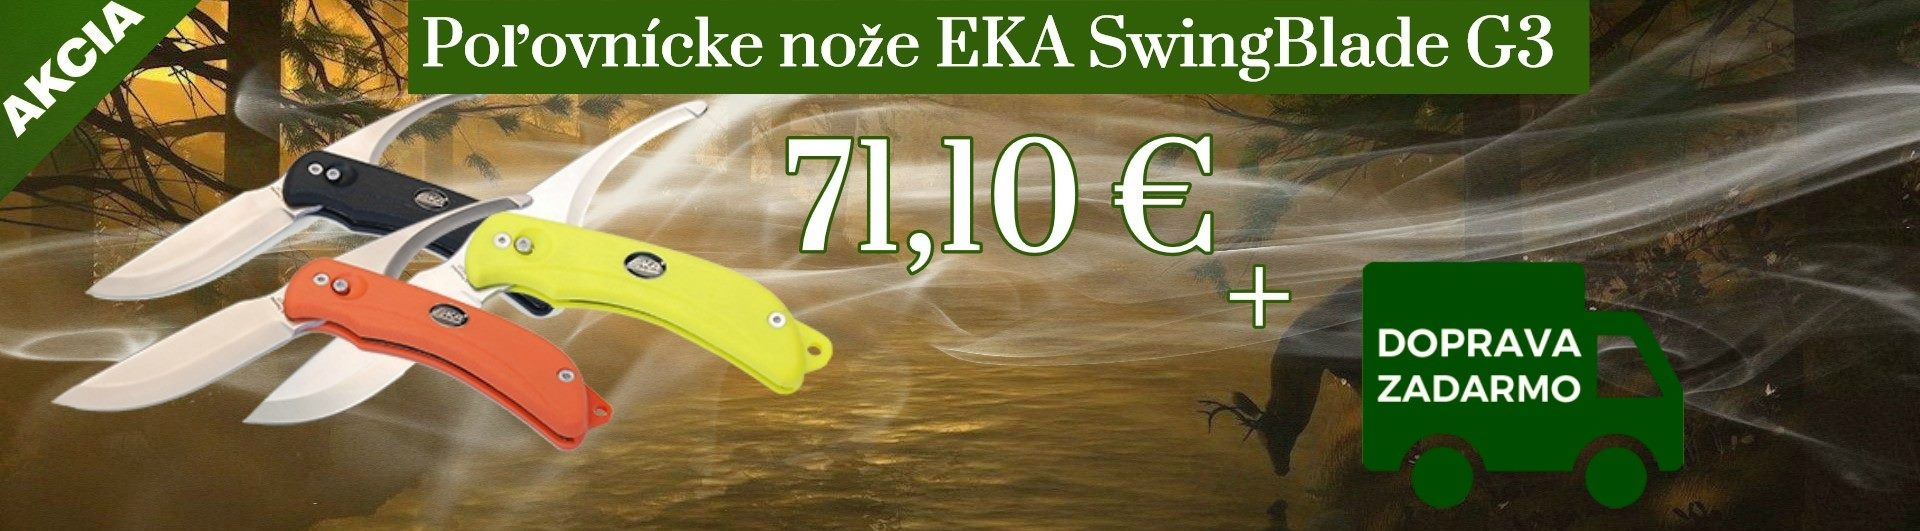 Eka SwingBlade G3